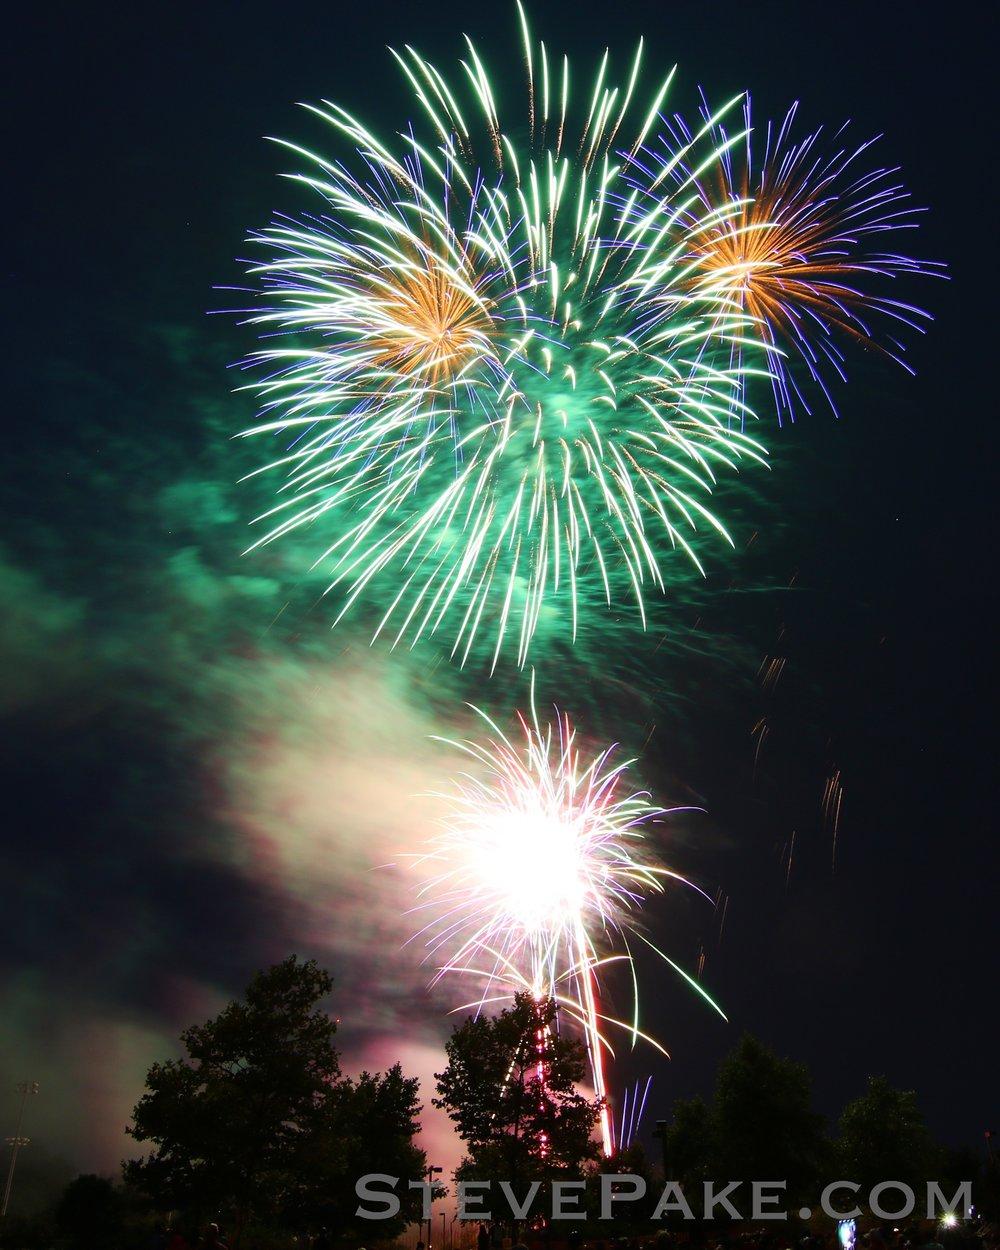 Fireworks2018_31_GE3A8561ap-HD-WM.jpg